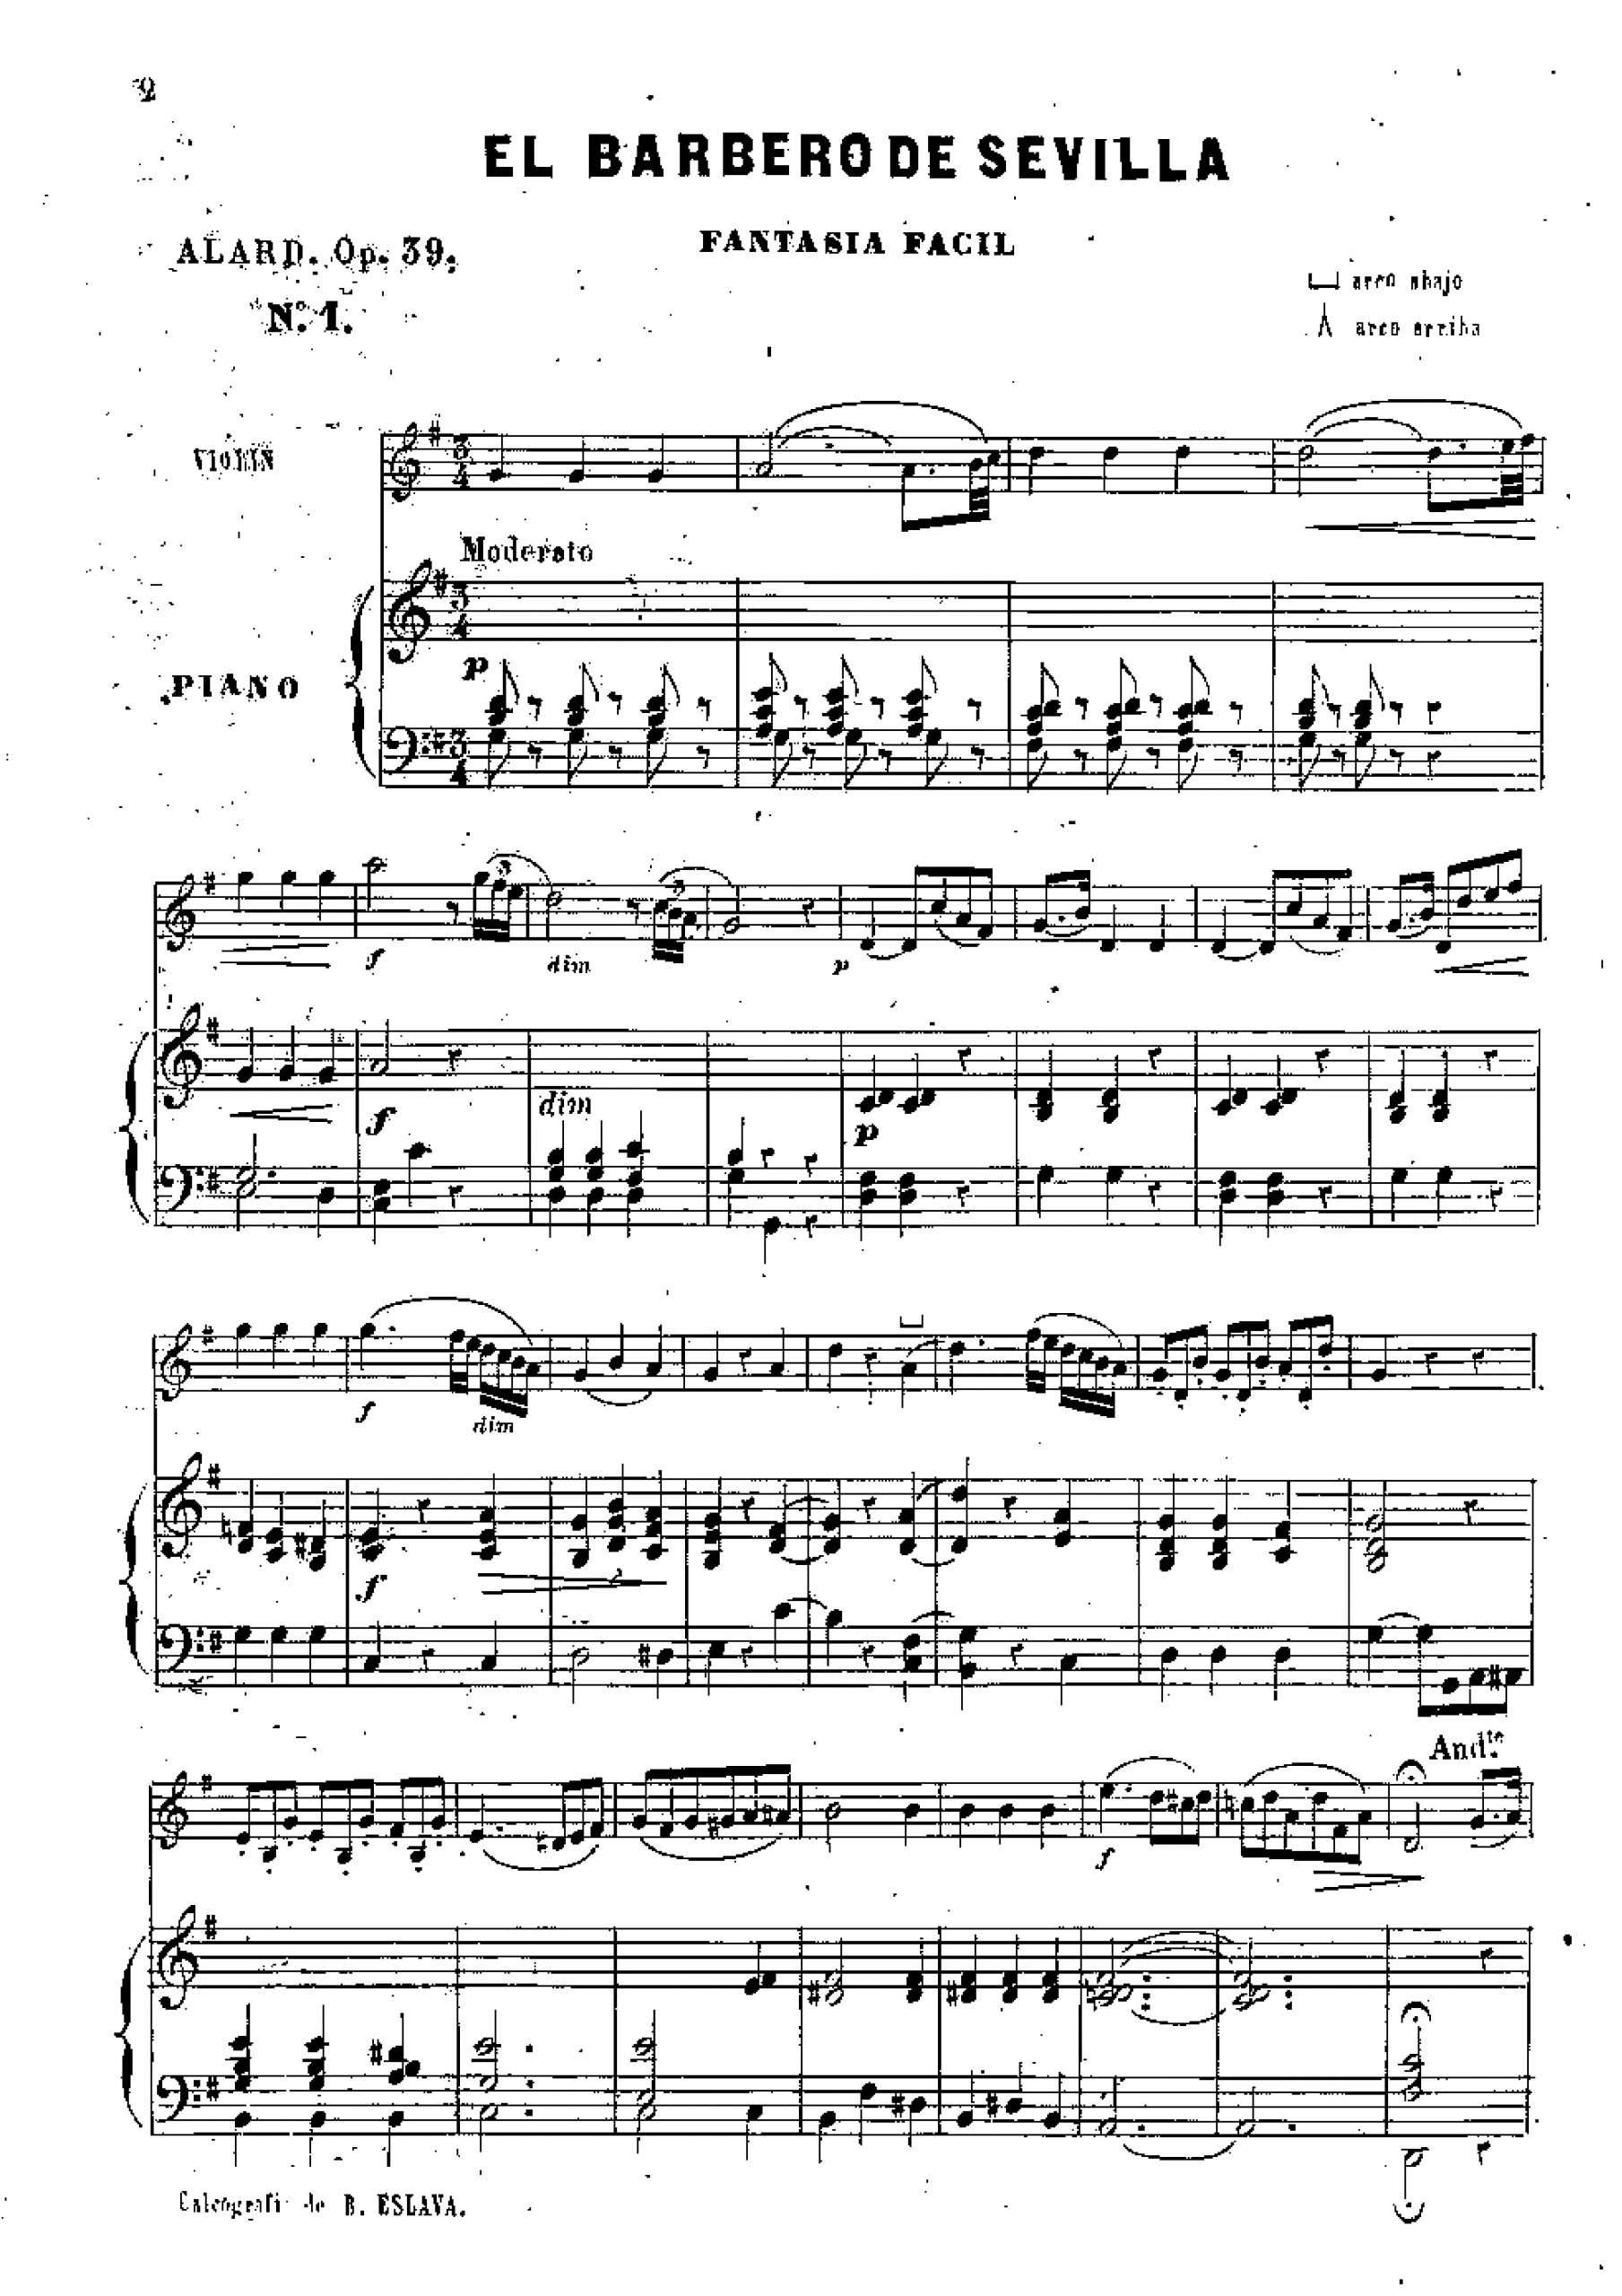 Alard, Jean Delphin - 8 Fantaisies faciles, Op.39 (no.4 pno)